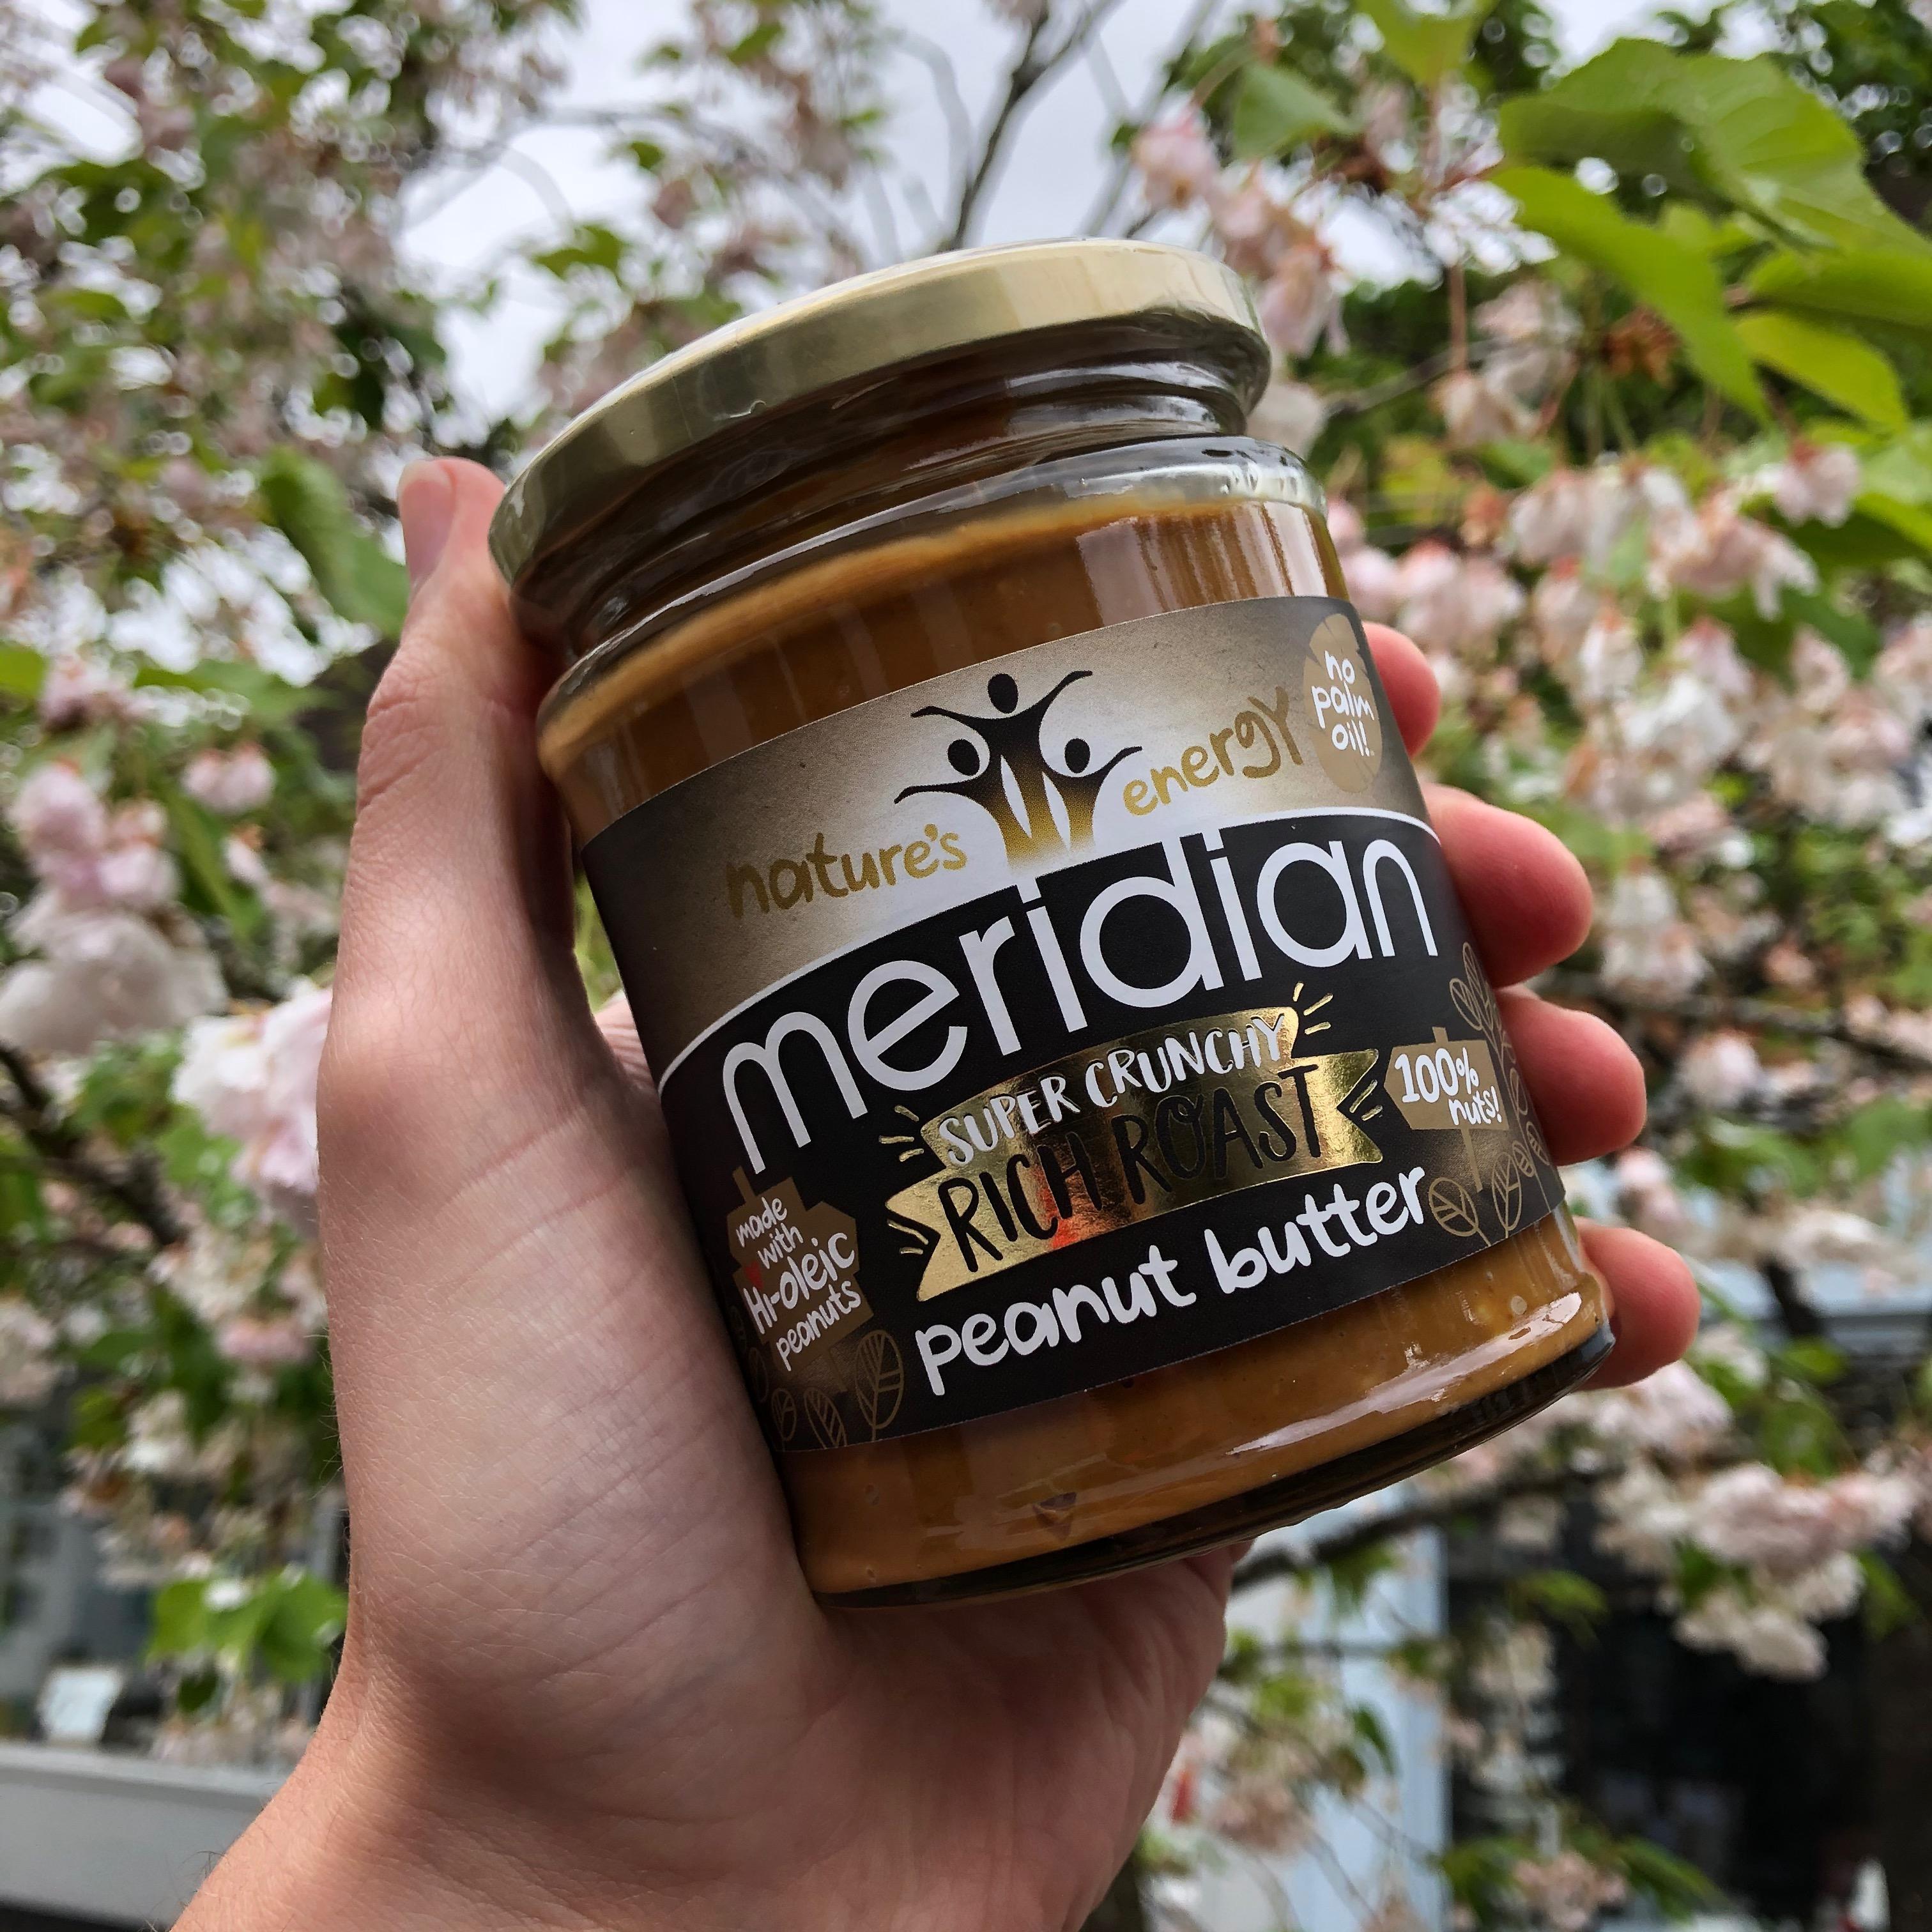 Meridian Super Crunchy Rich Roast (280g)